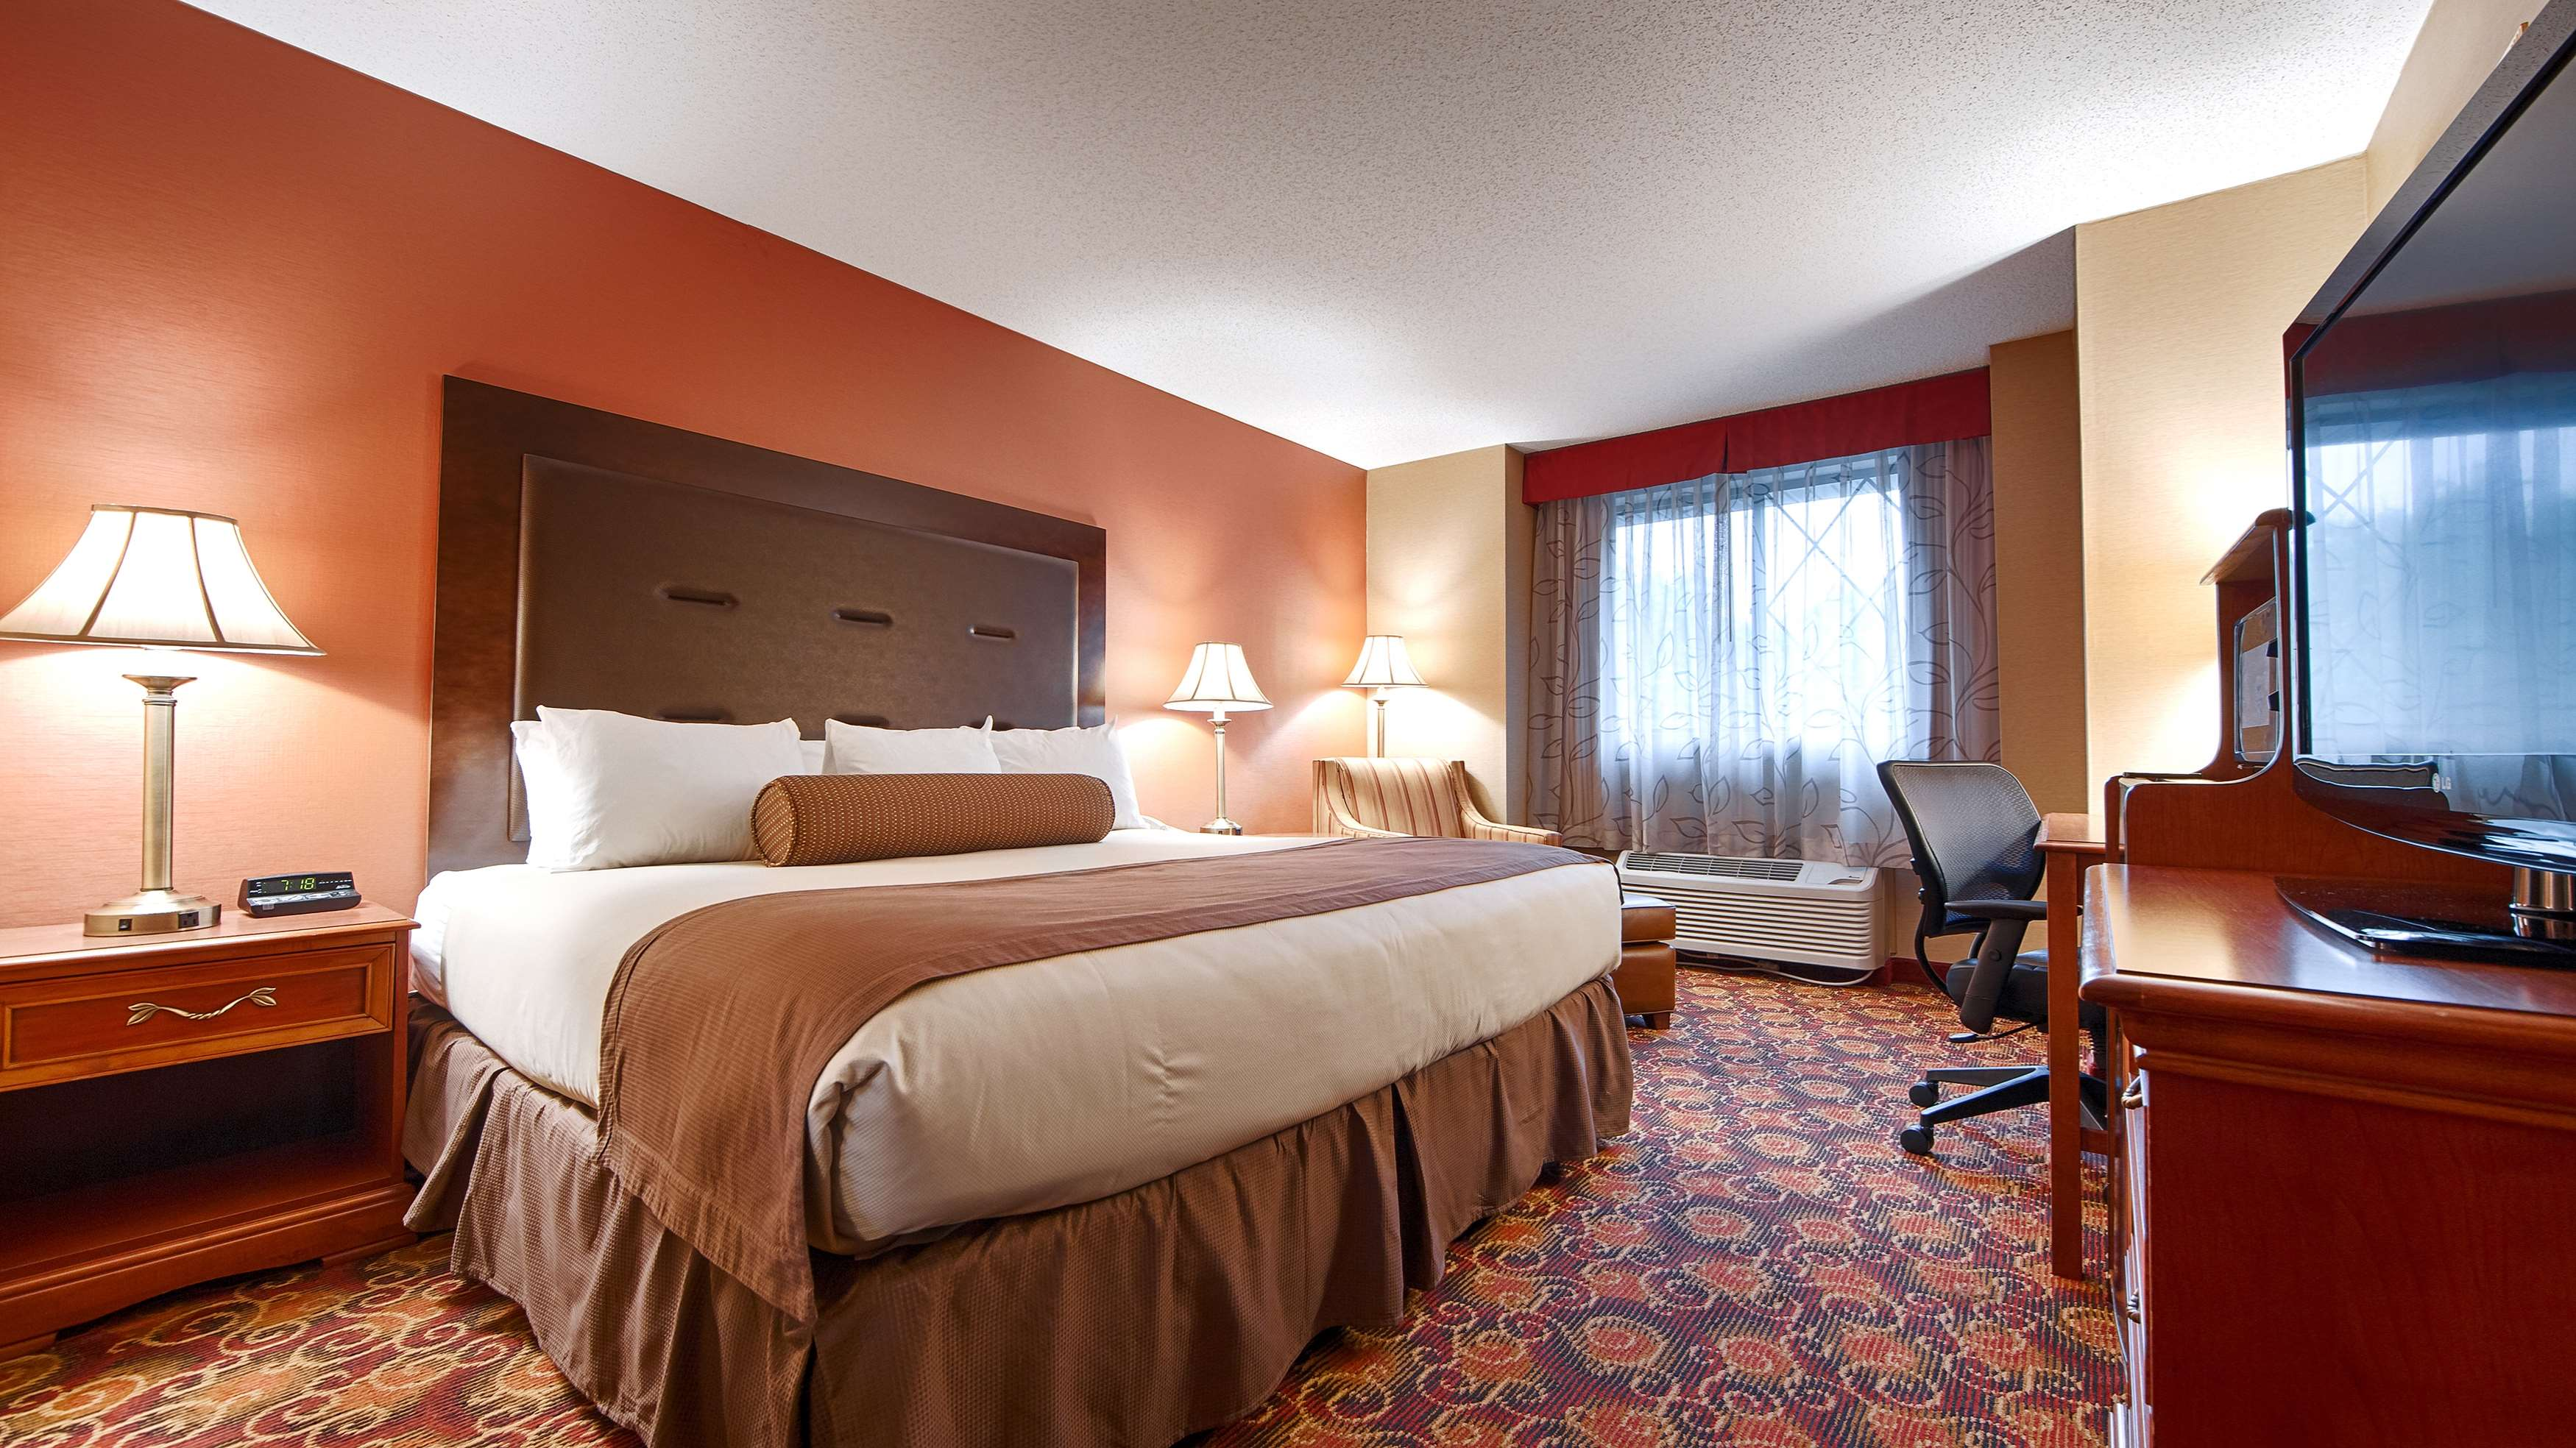 Best Western Plus The Inn at Sharon/Foxboro image 11